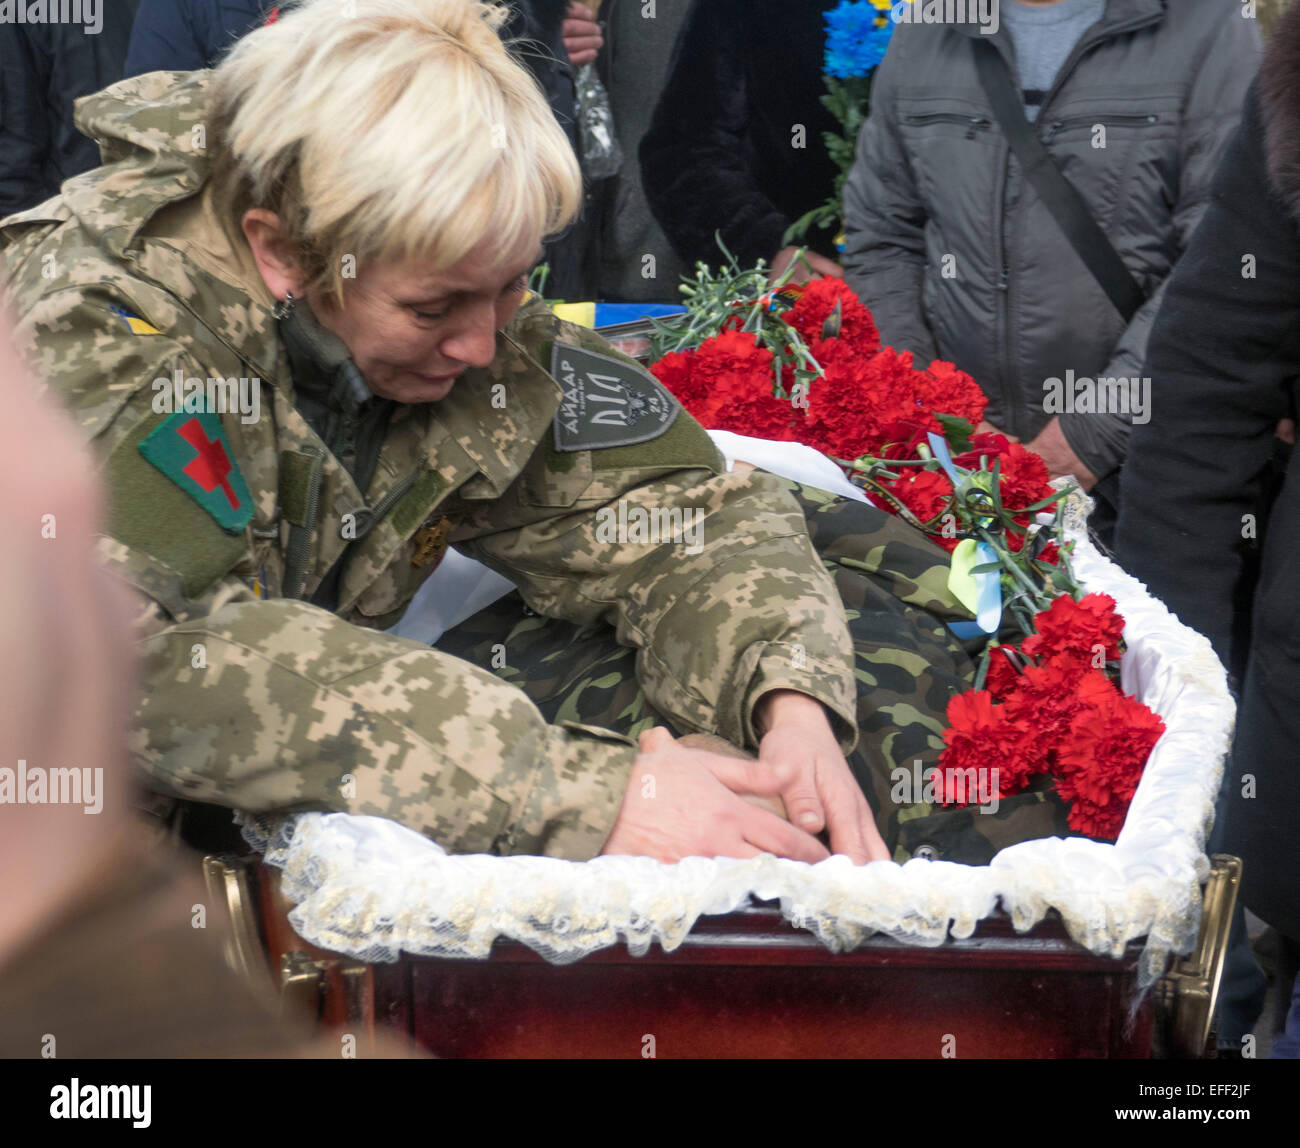 Kiev, Ukraine. 02nd Feb, 2015. Servicewomen of the Ukrainian volunteer battallion Aydar mourns next to the coffin - Stock Image